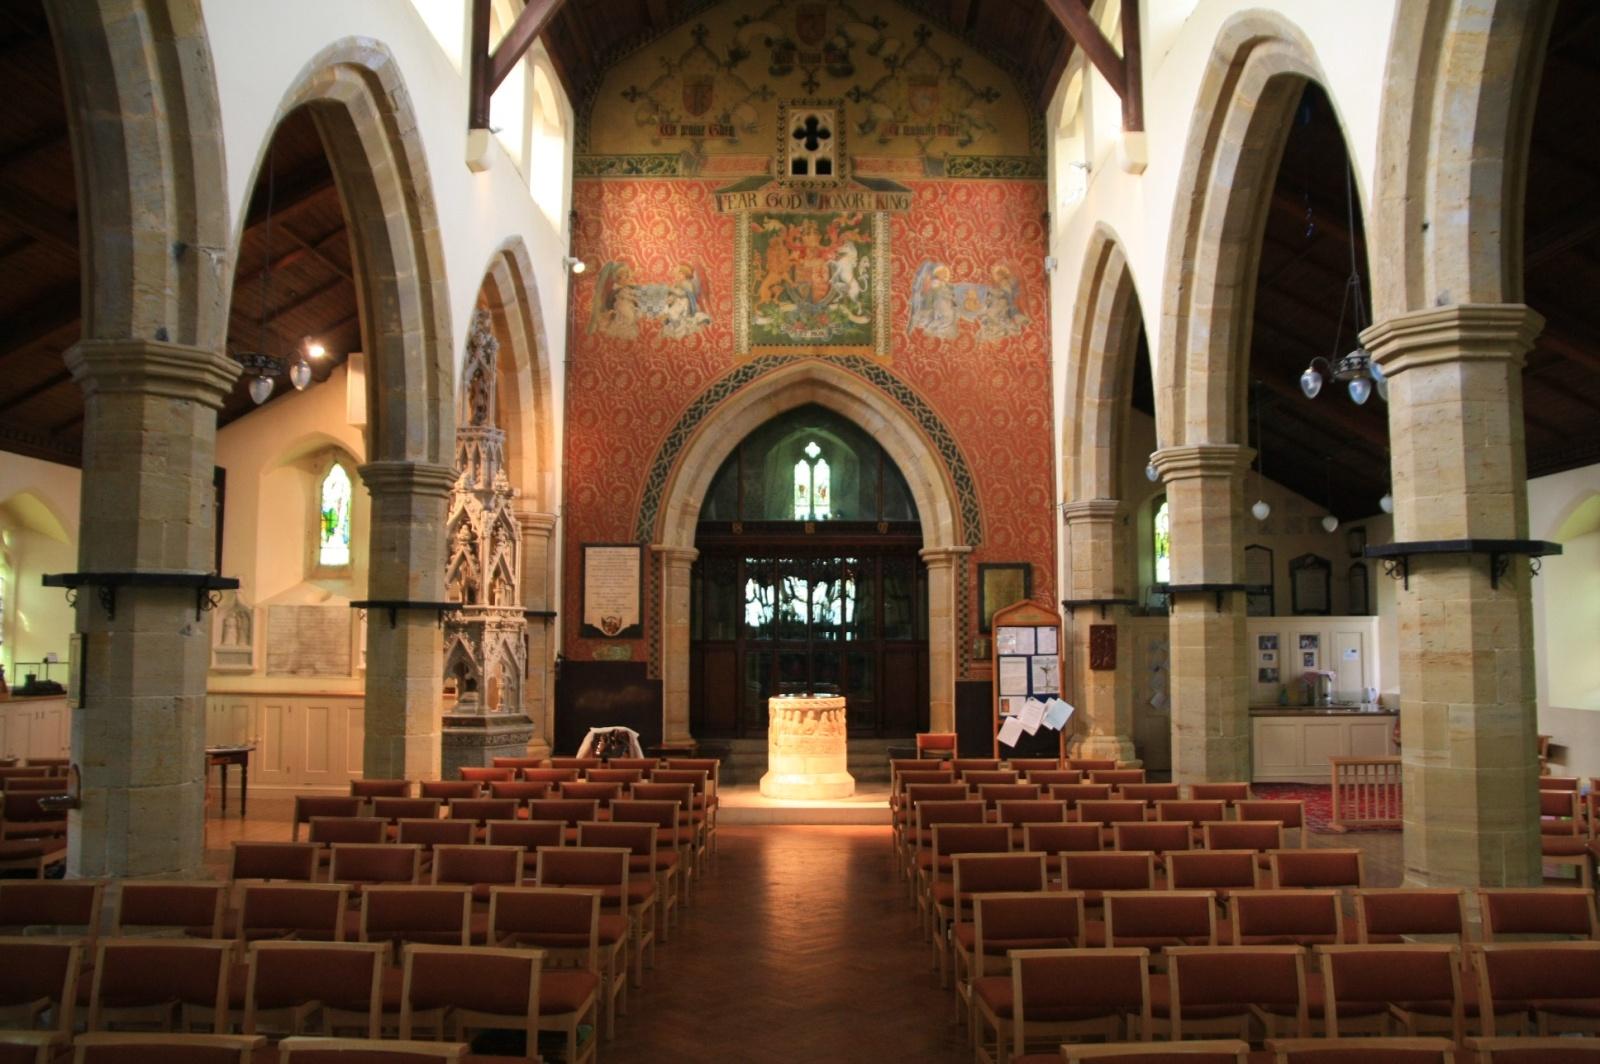 Interior of St. Nicholas'